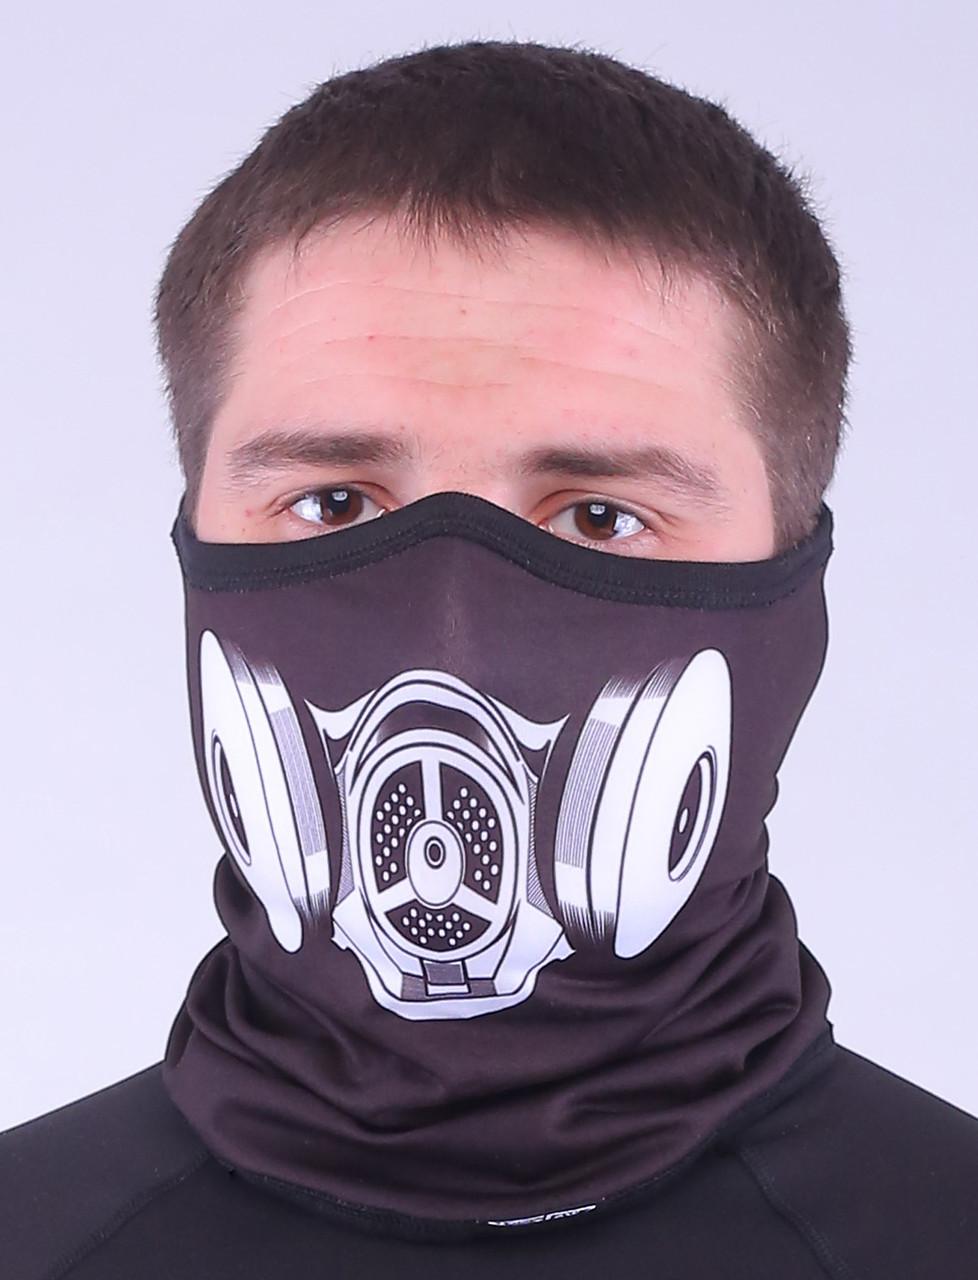 Термоактивный бафф SportZone Maska MLK. Теплая лыжная маска.